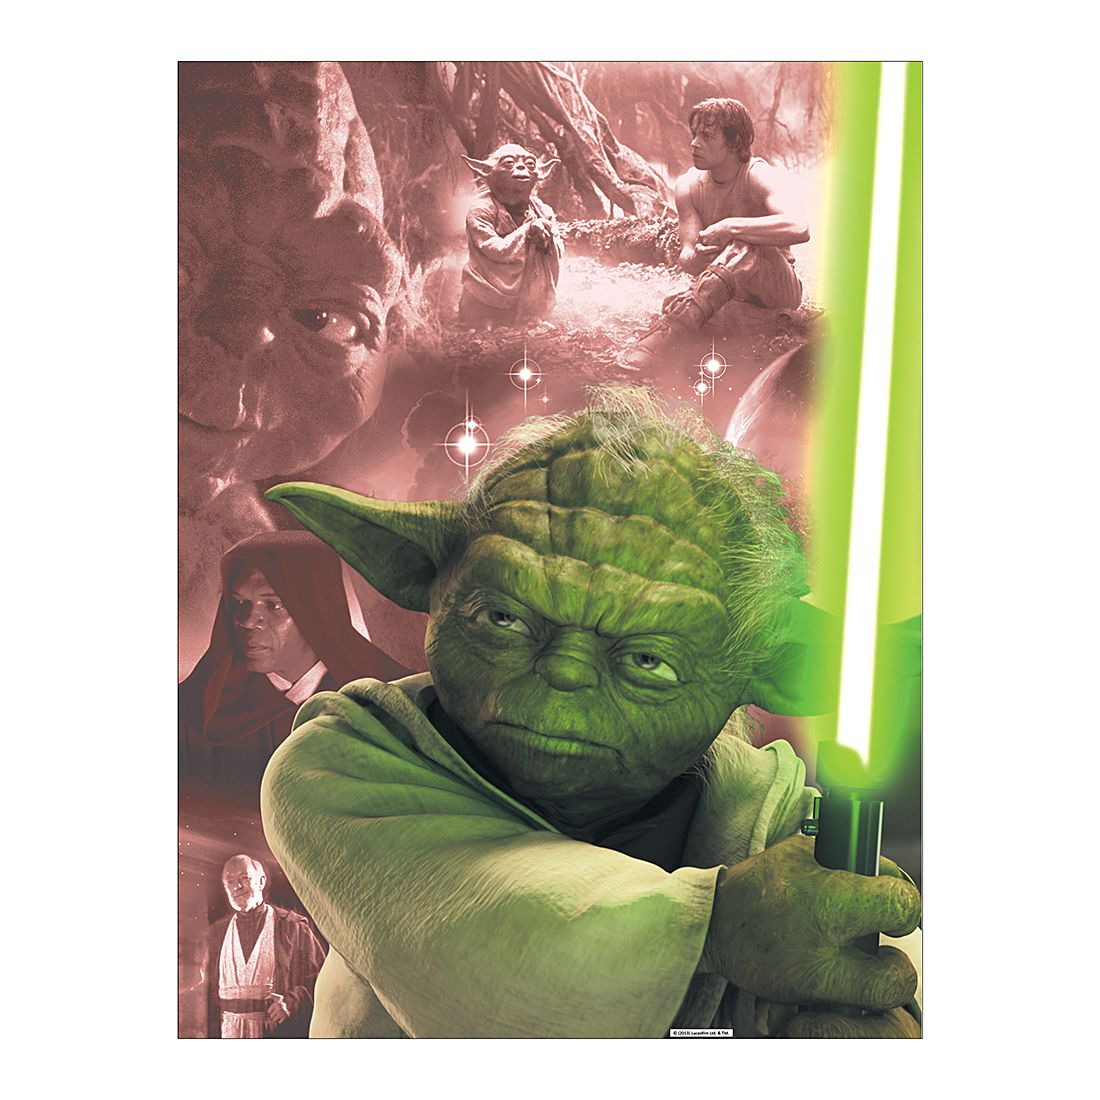 Acryl-Aluminium-Bild Yoda – Abmessung: 100 x 75 cm, Gallery of Innovative Art günstig bestellen